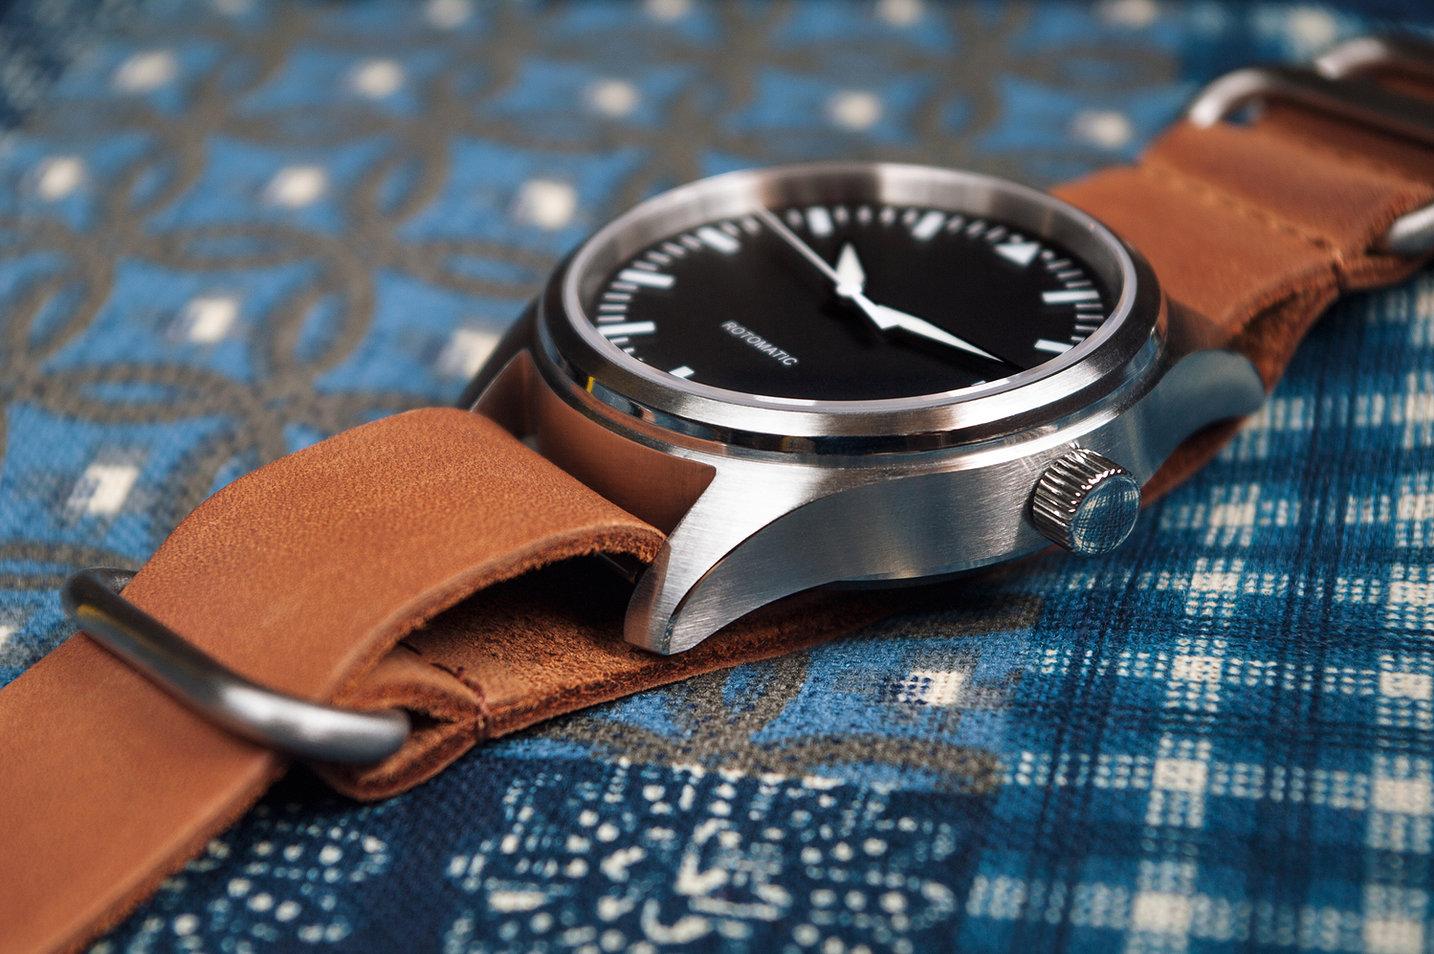 ronin watch close up